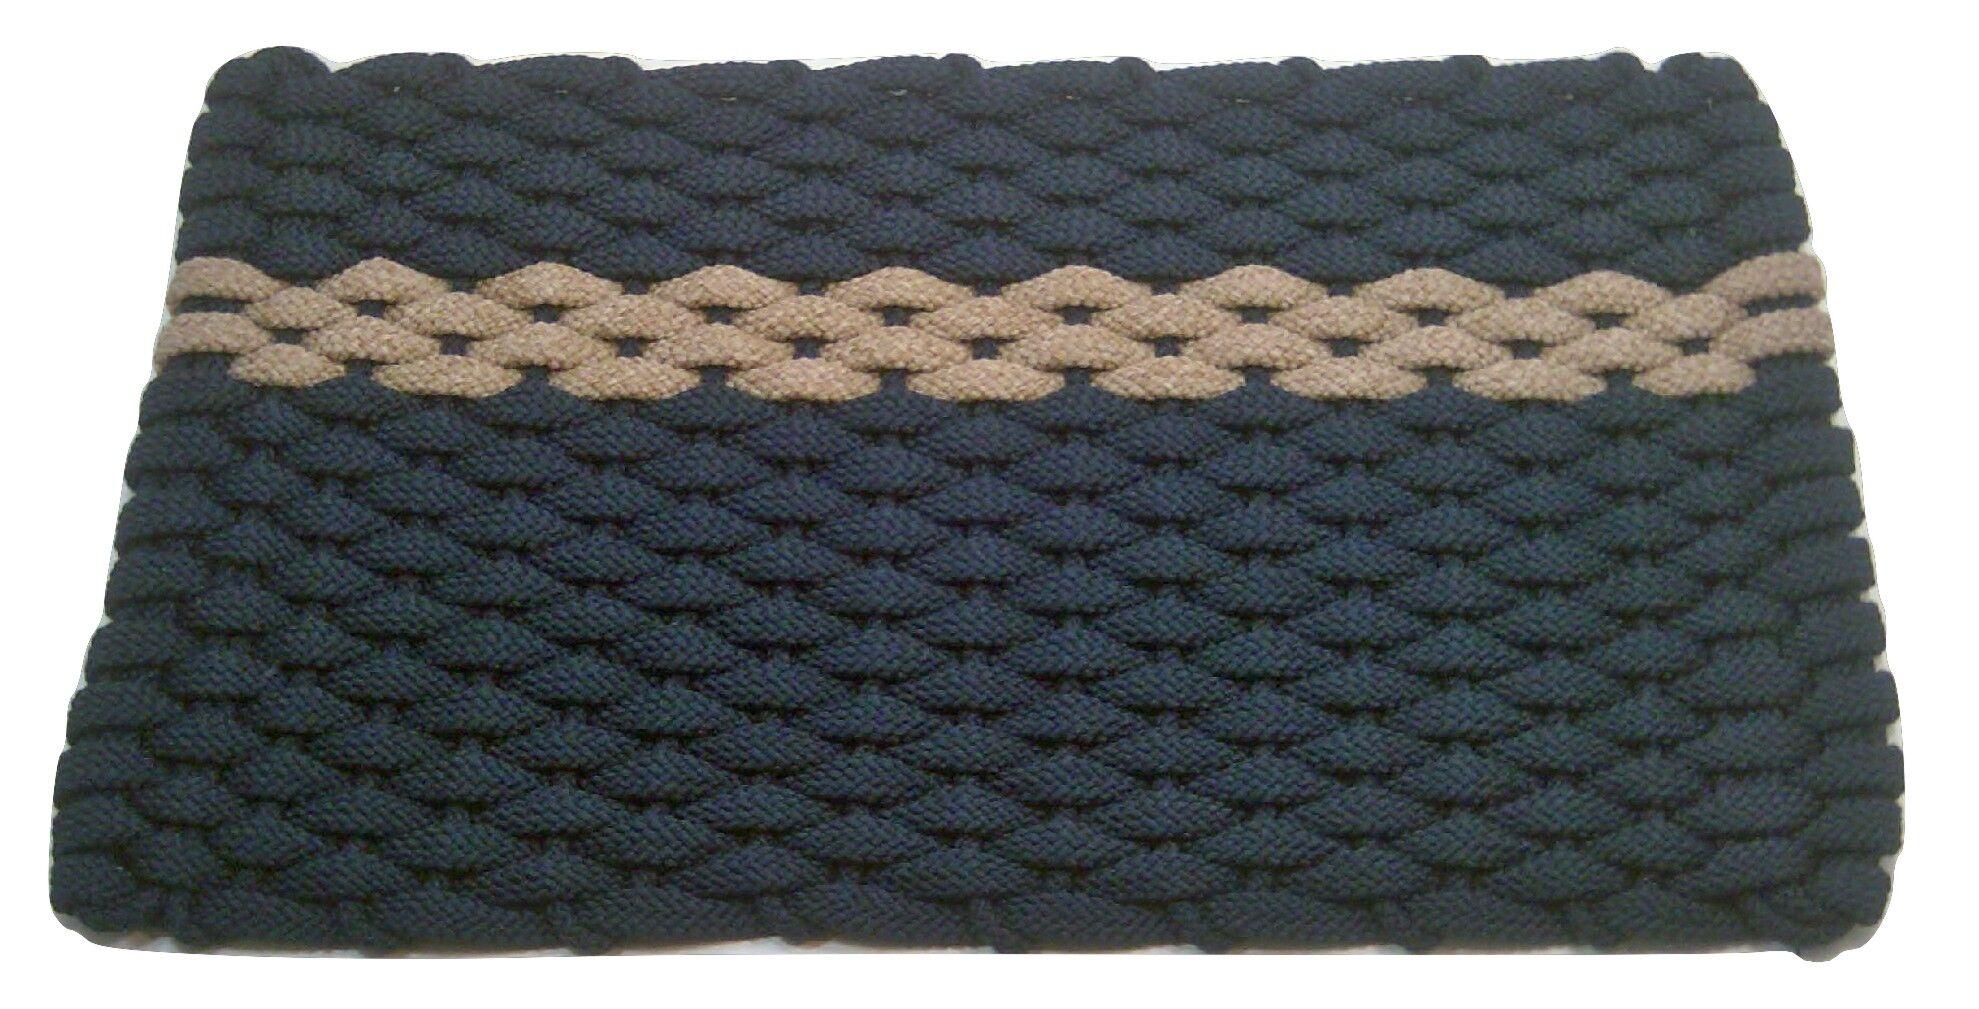 Catalin Doormat Mat Size: 2' x 3'2